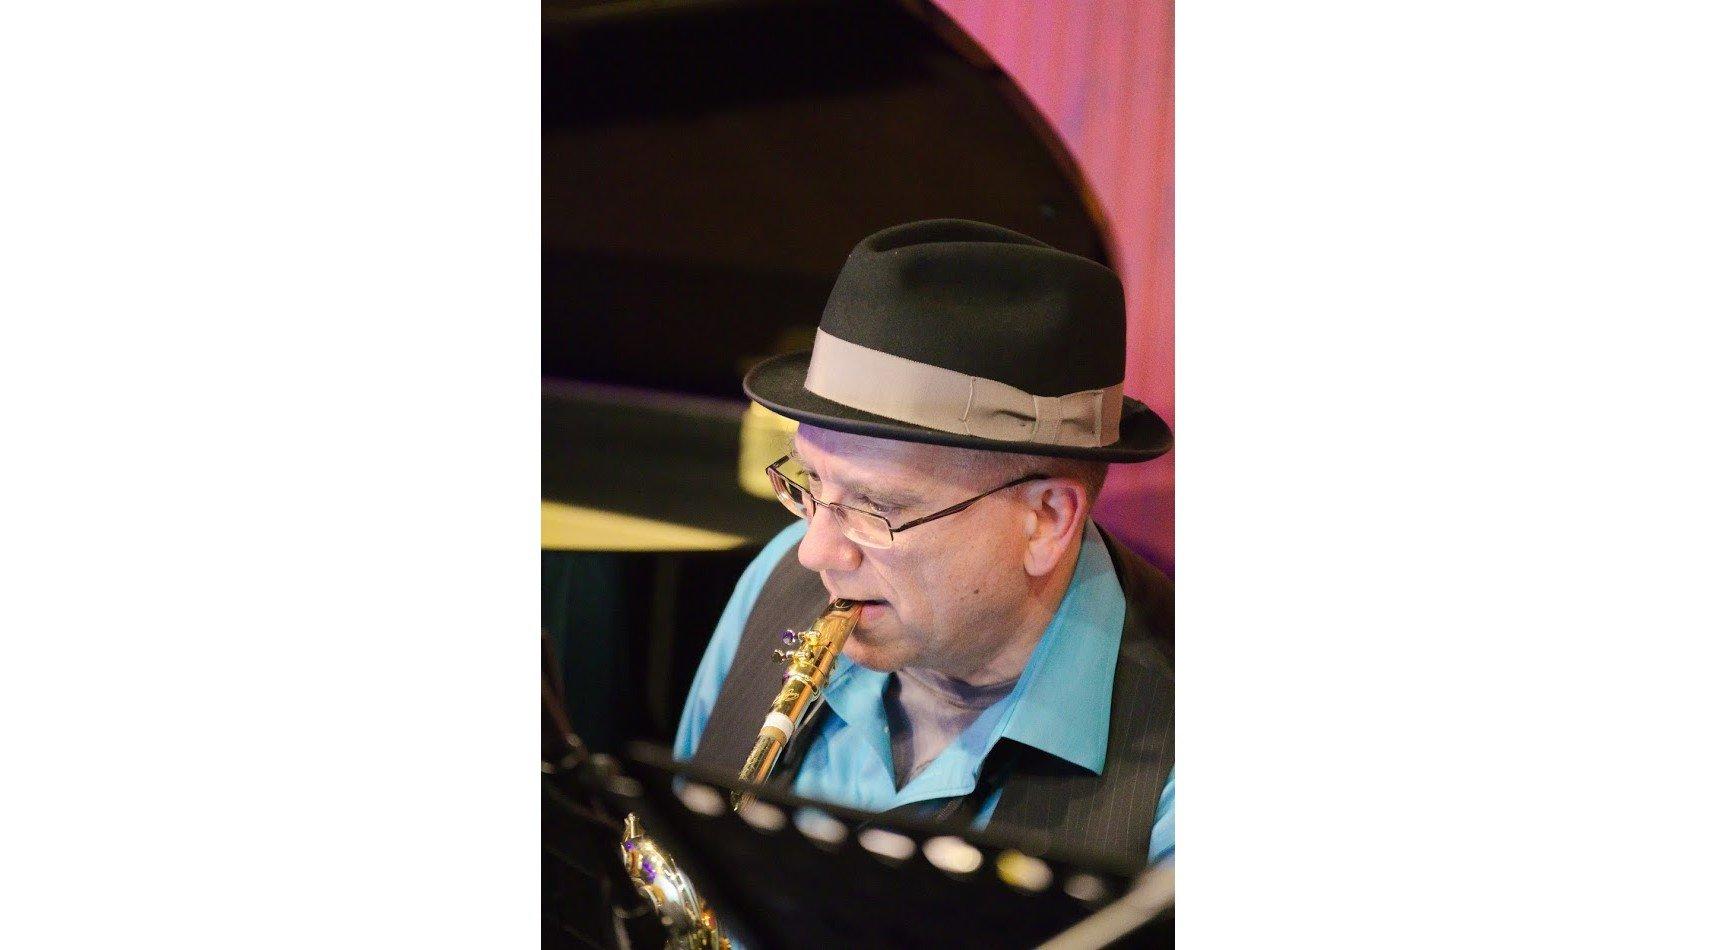 Danny playing bari sax